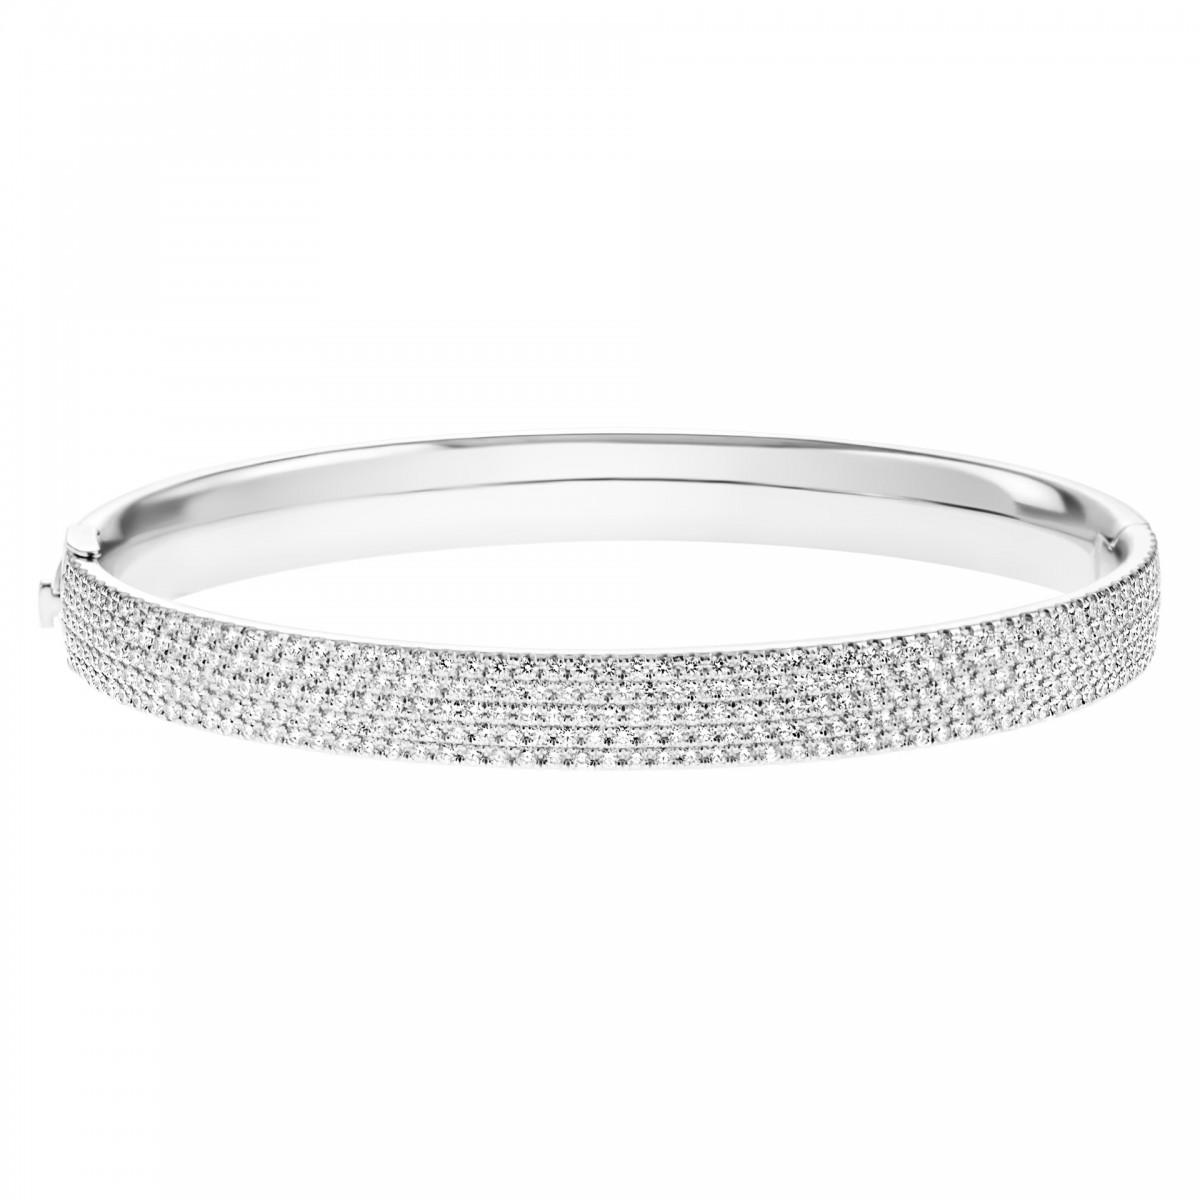 14bfc4b4b Tiffany & Co Metro diamond bangle in 18k white gold | Gray & Sons Jewe